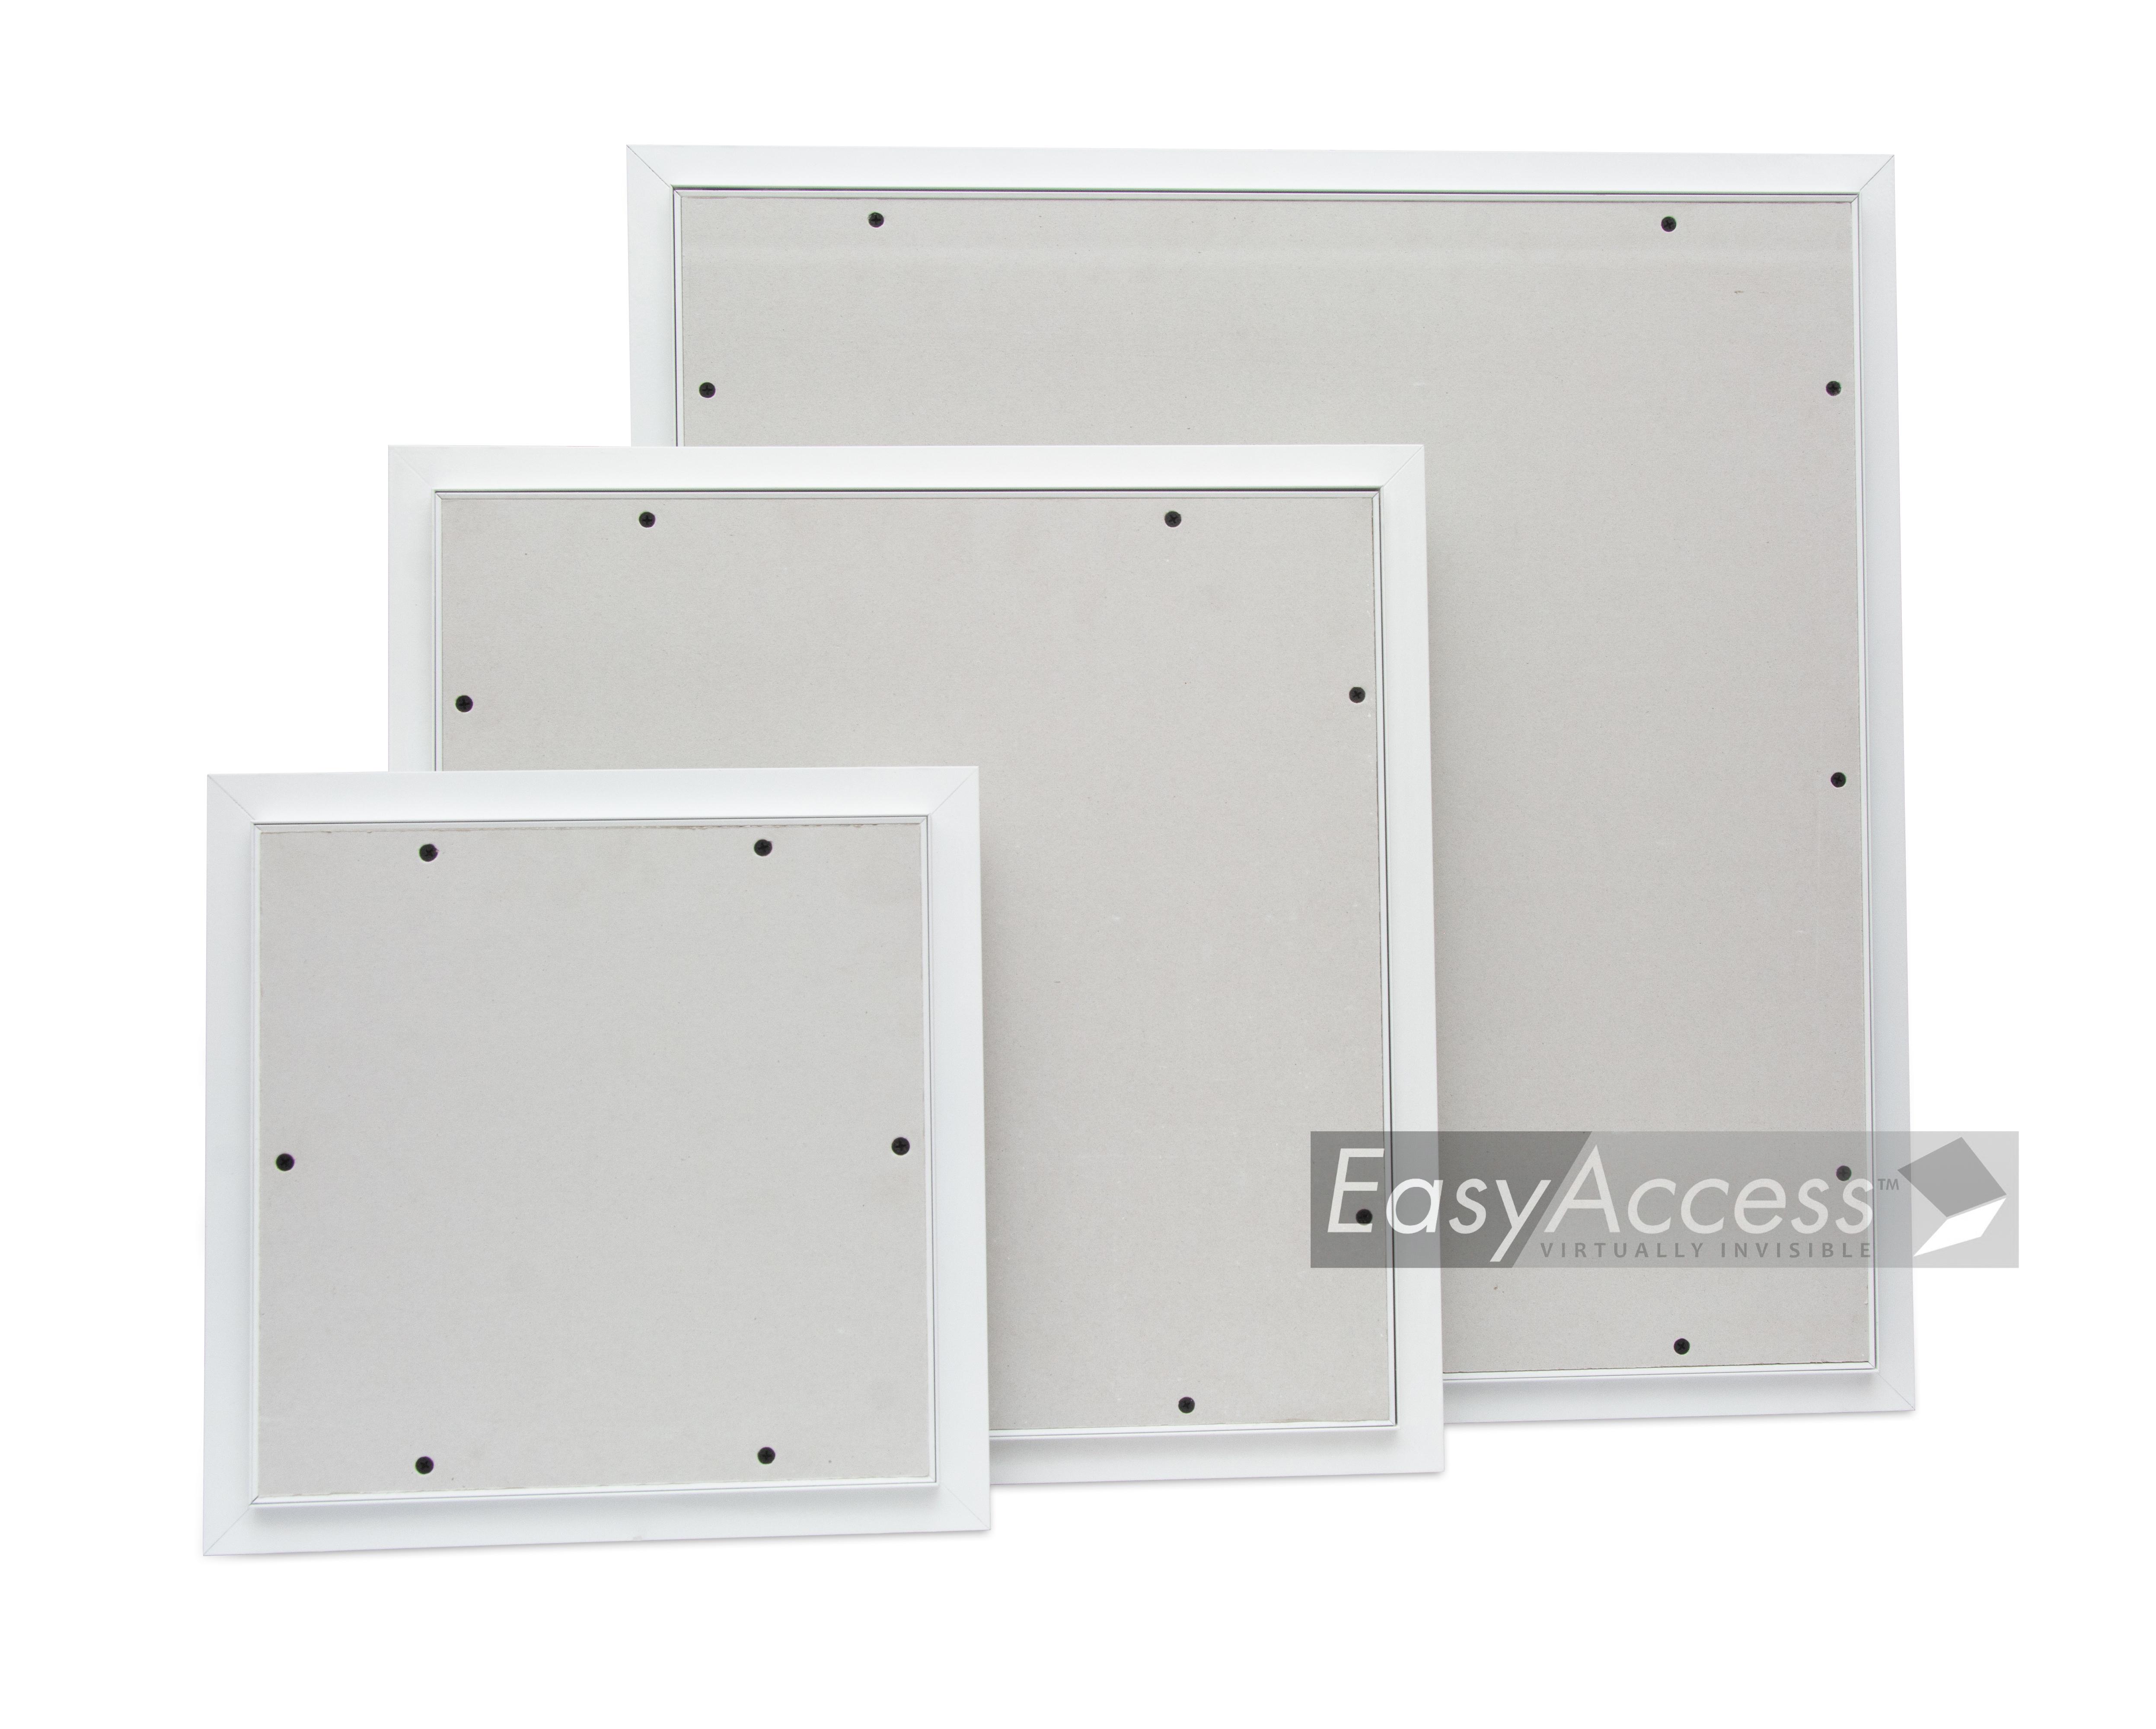 Aluminum Frame Access Panel Trap door